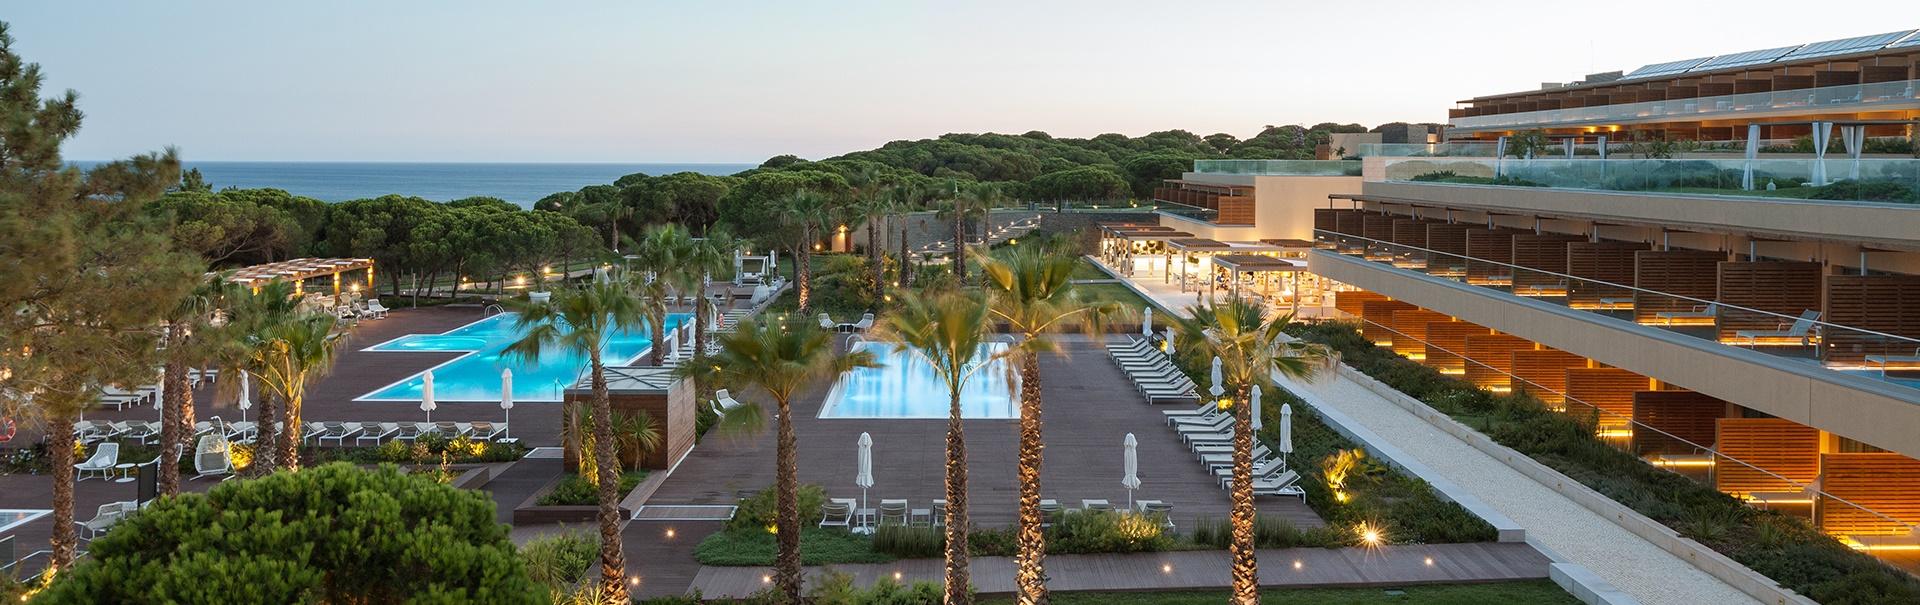 All Inclusive Sun Holidays to Epic Sana Algarve